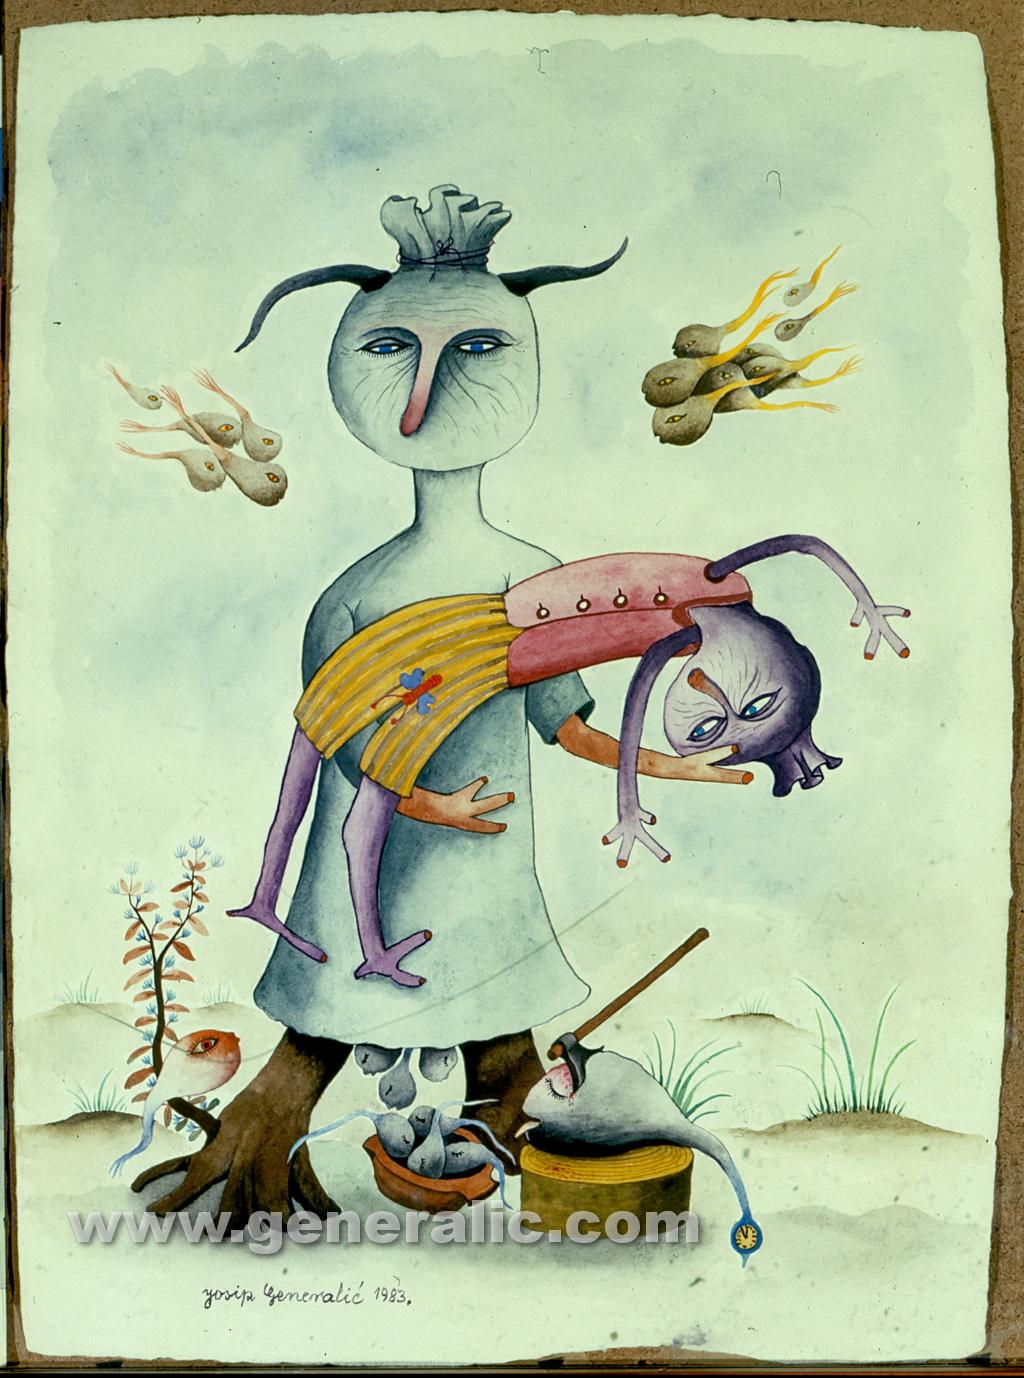 Josip Generalic, 1983, Puppets with fish, watercolour